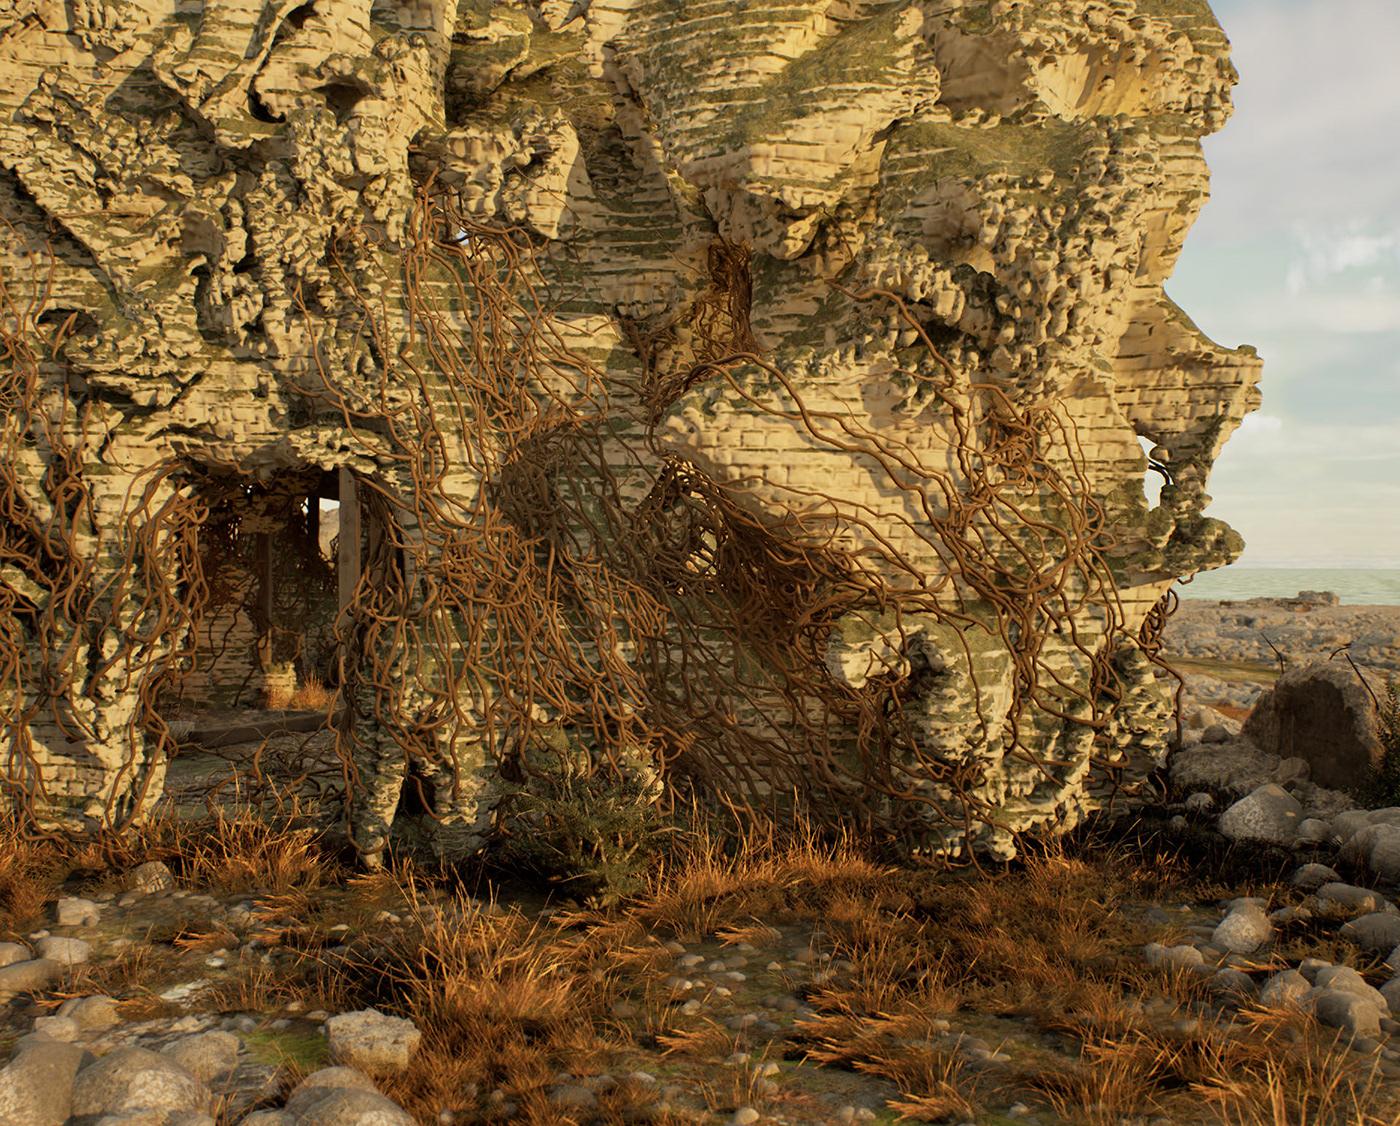 architecture parametric generative design simulation growth house 3d print digital swarm